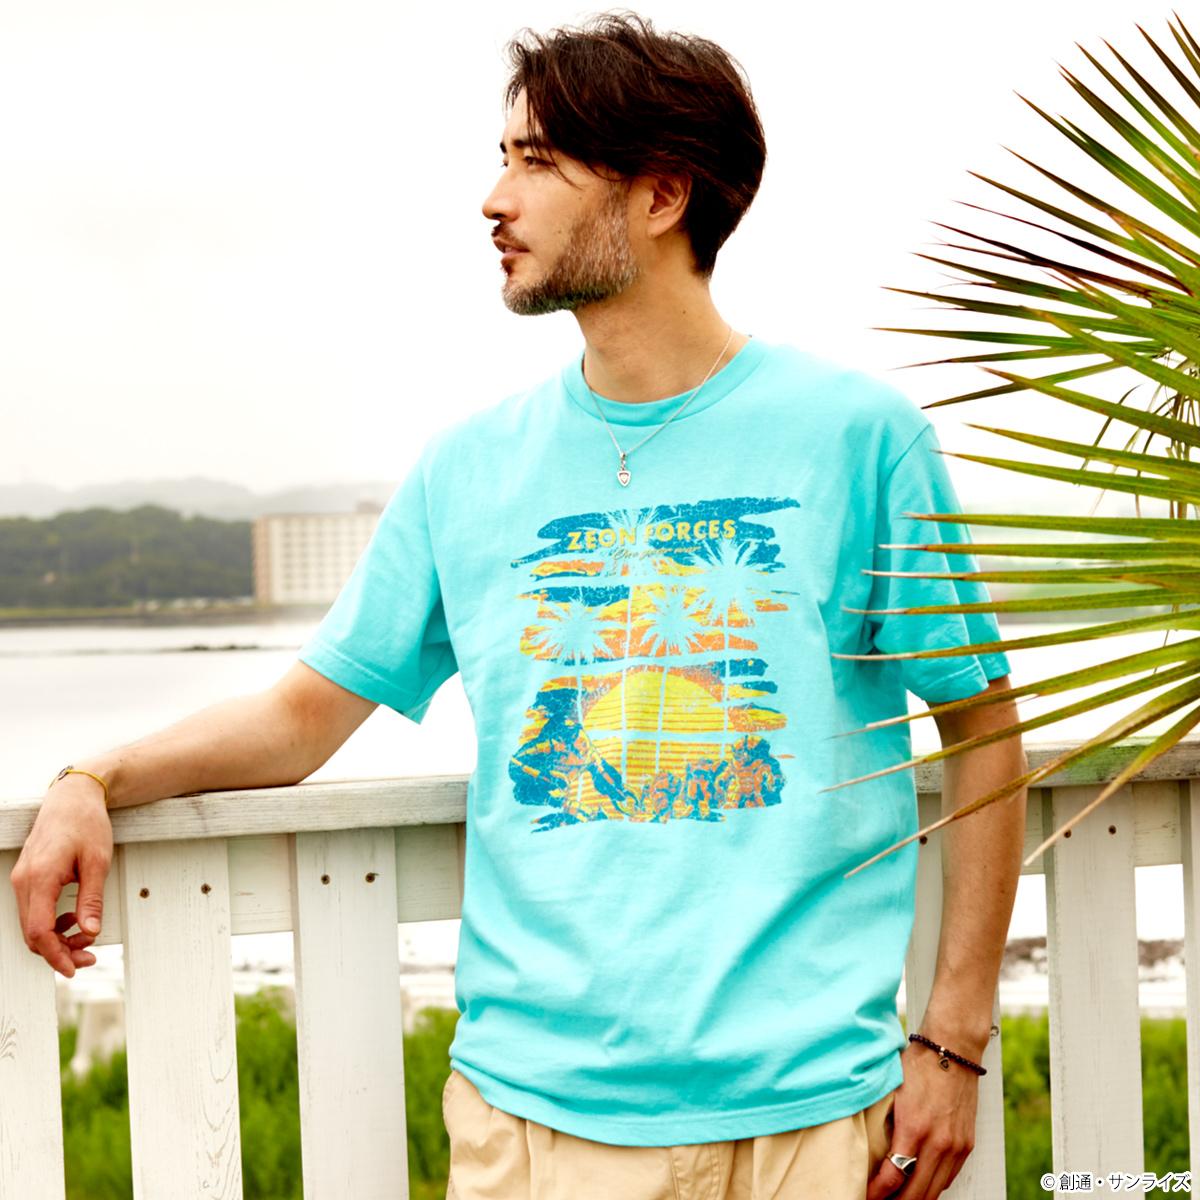 STRICT-G『機動戦士ガンダム』 サーフコレクションTシャツ サンセットジオン軍水陸両用MS柄